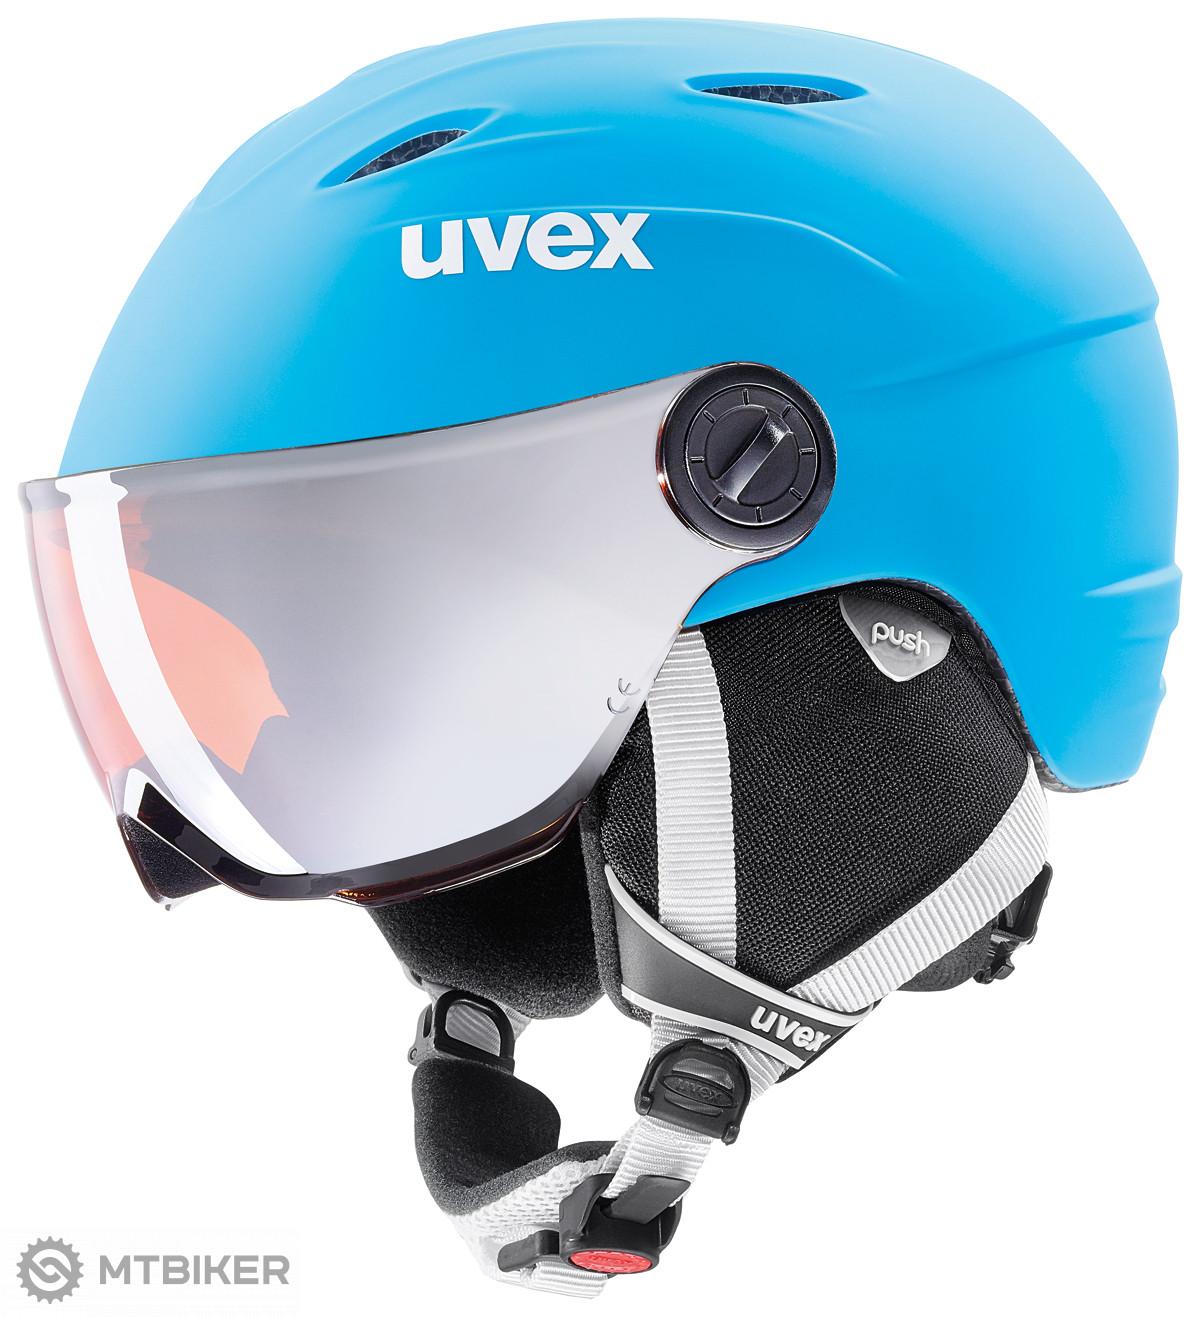 aa0d7516f UVEX Junior Visor Pro Liteblue/white mat lyžiarska prilba - MTBIKER Shop